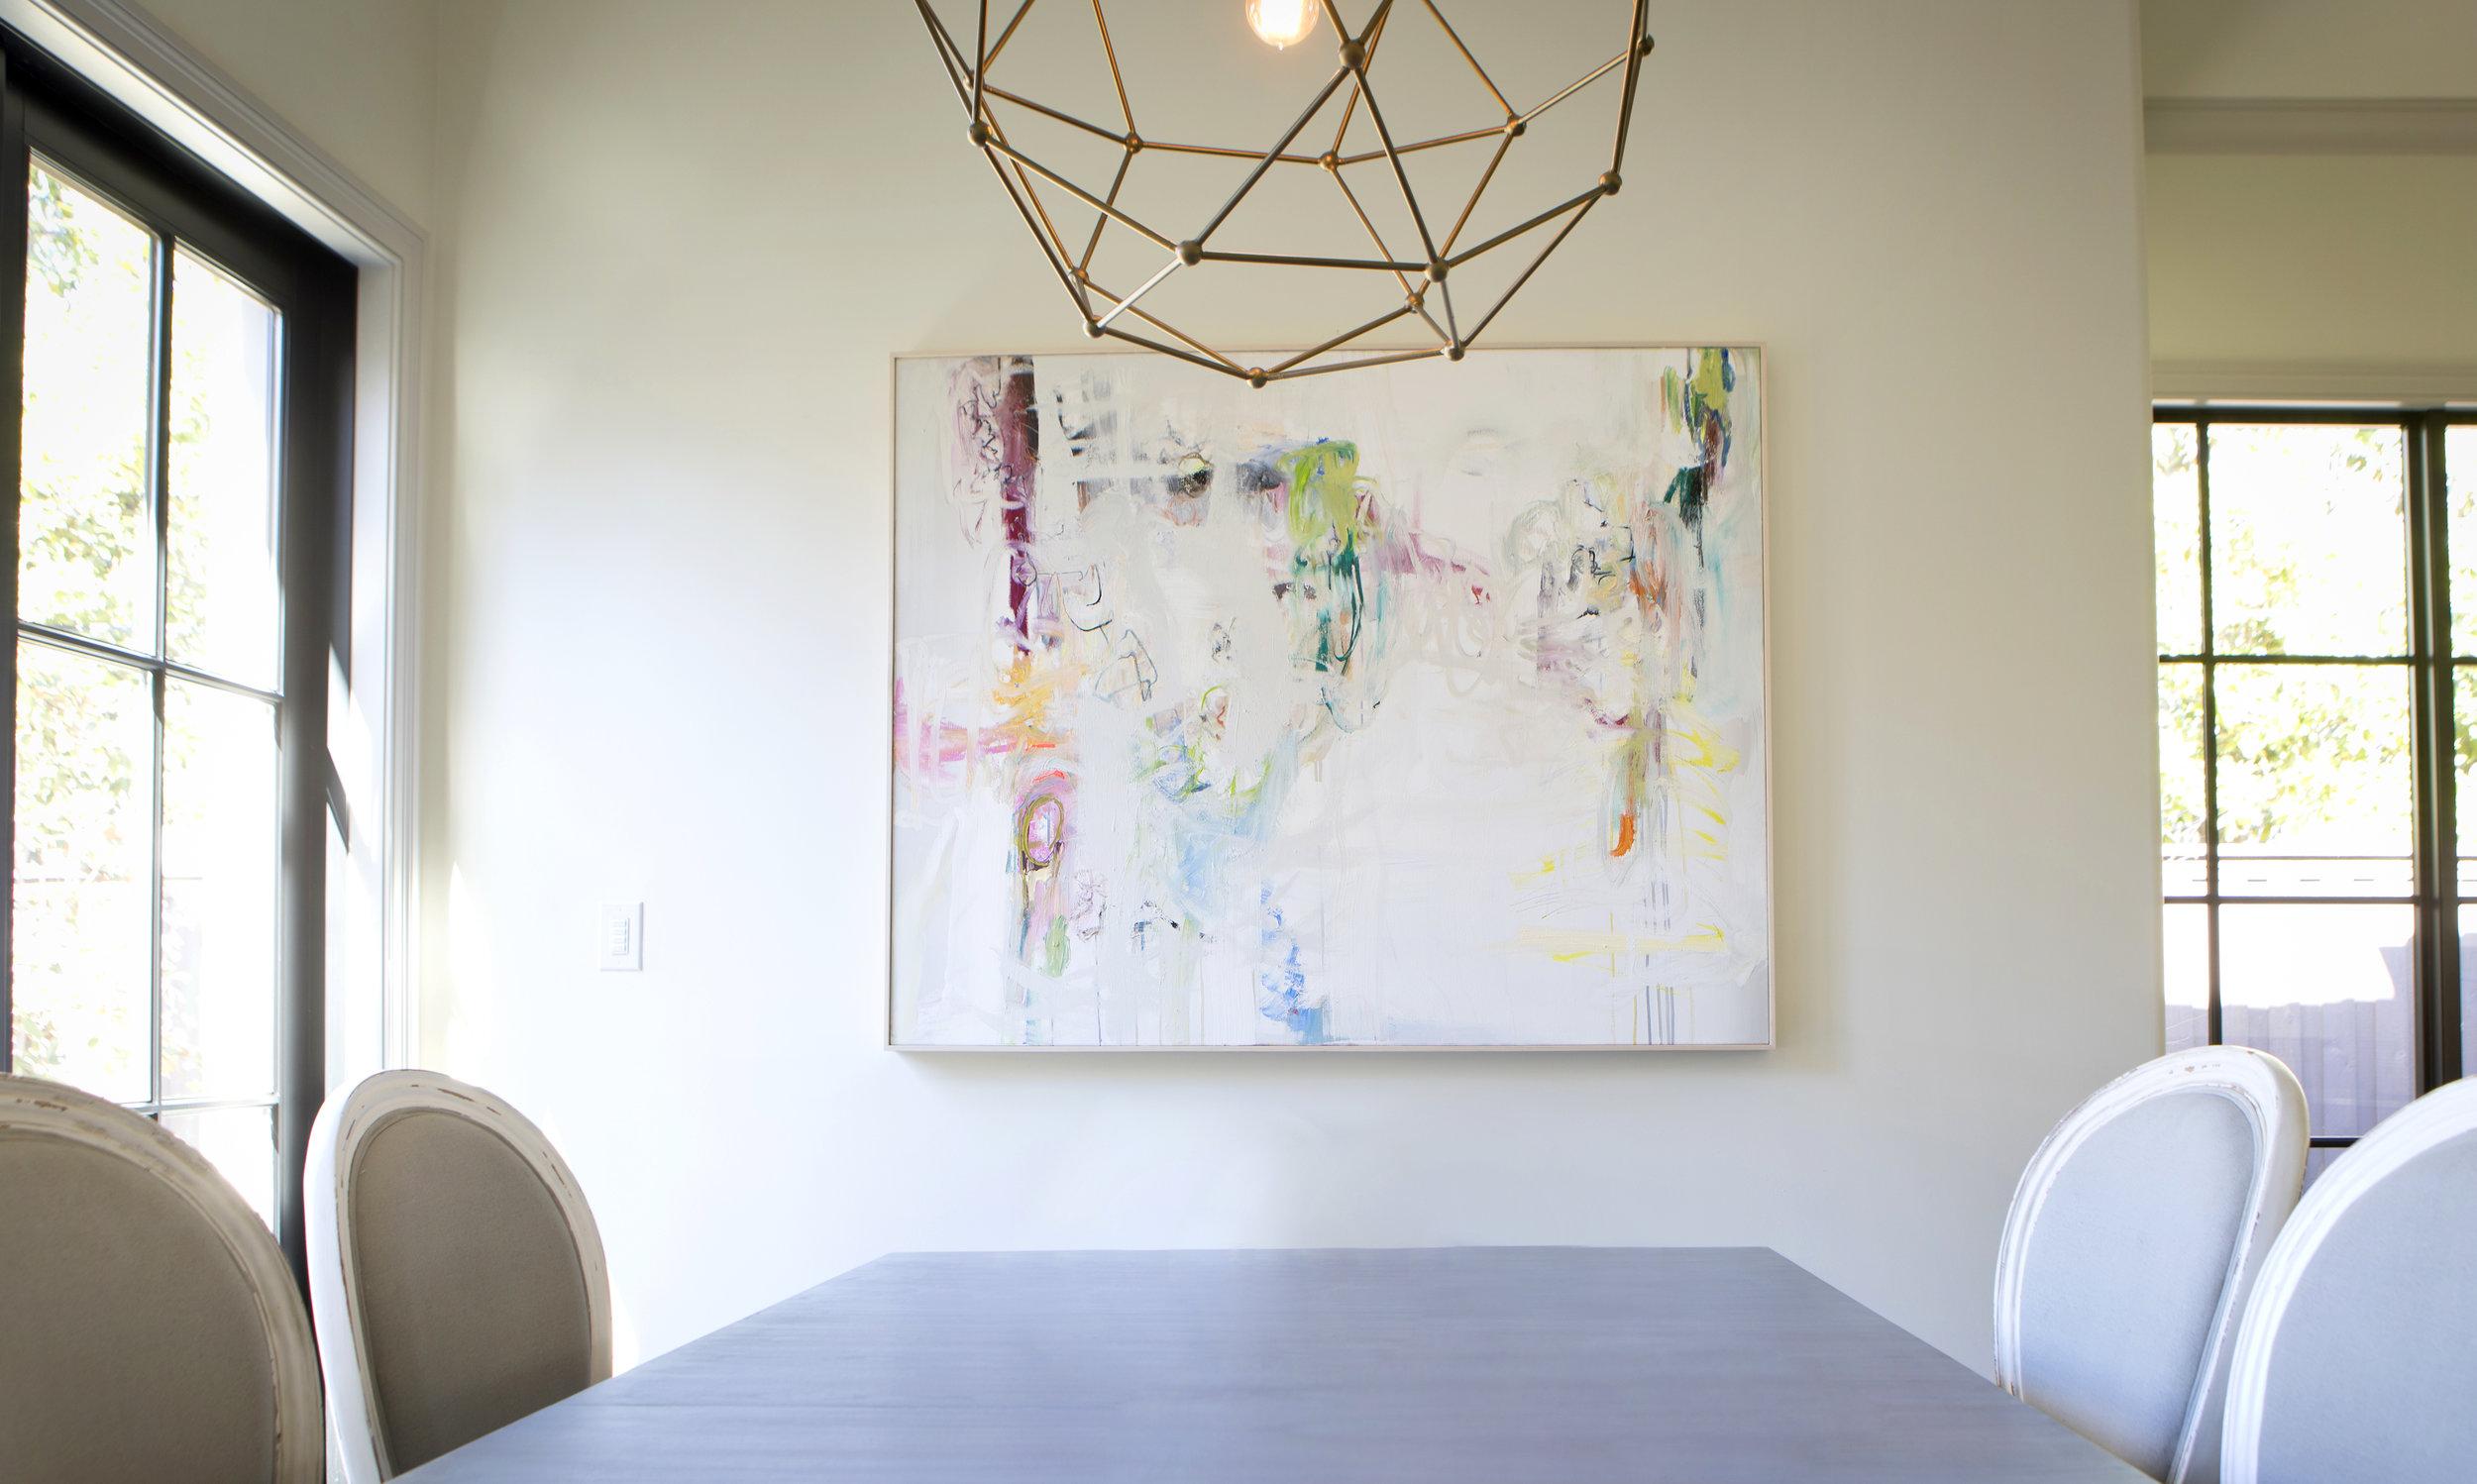 Wiley Fine Art Advisory